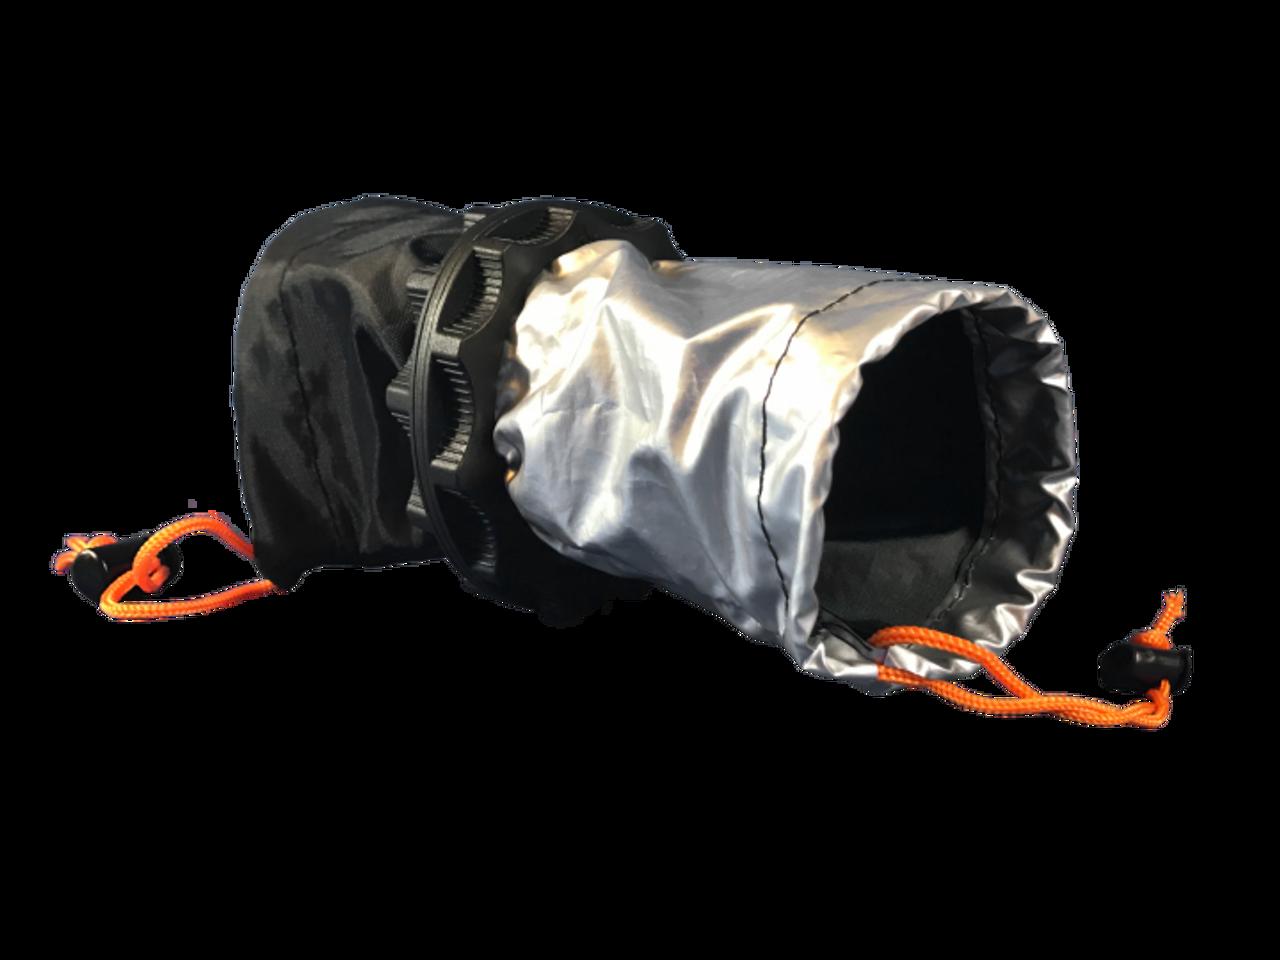 "SJ Kit Cable Flange 2.8"" Double Socks - R4.00"